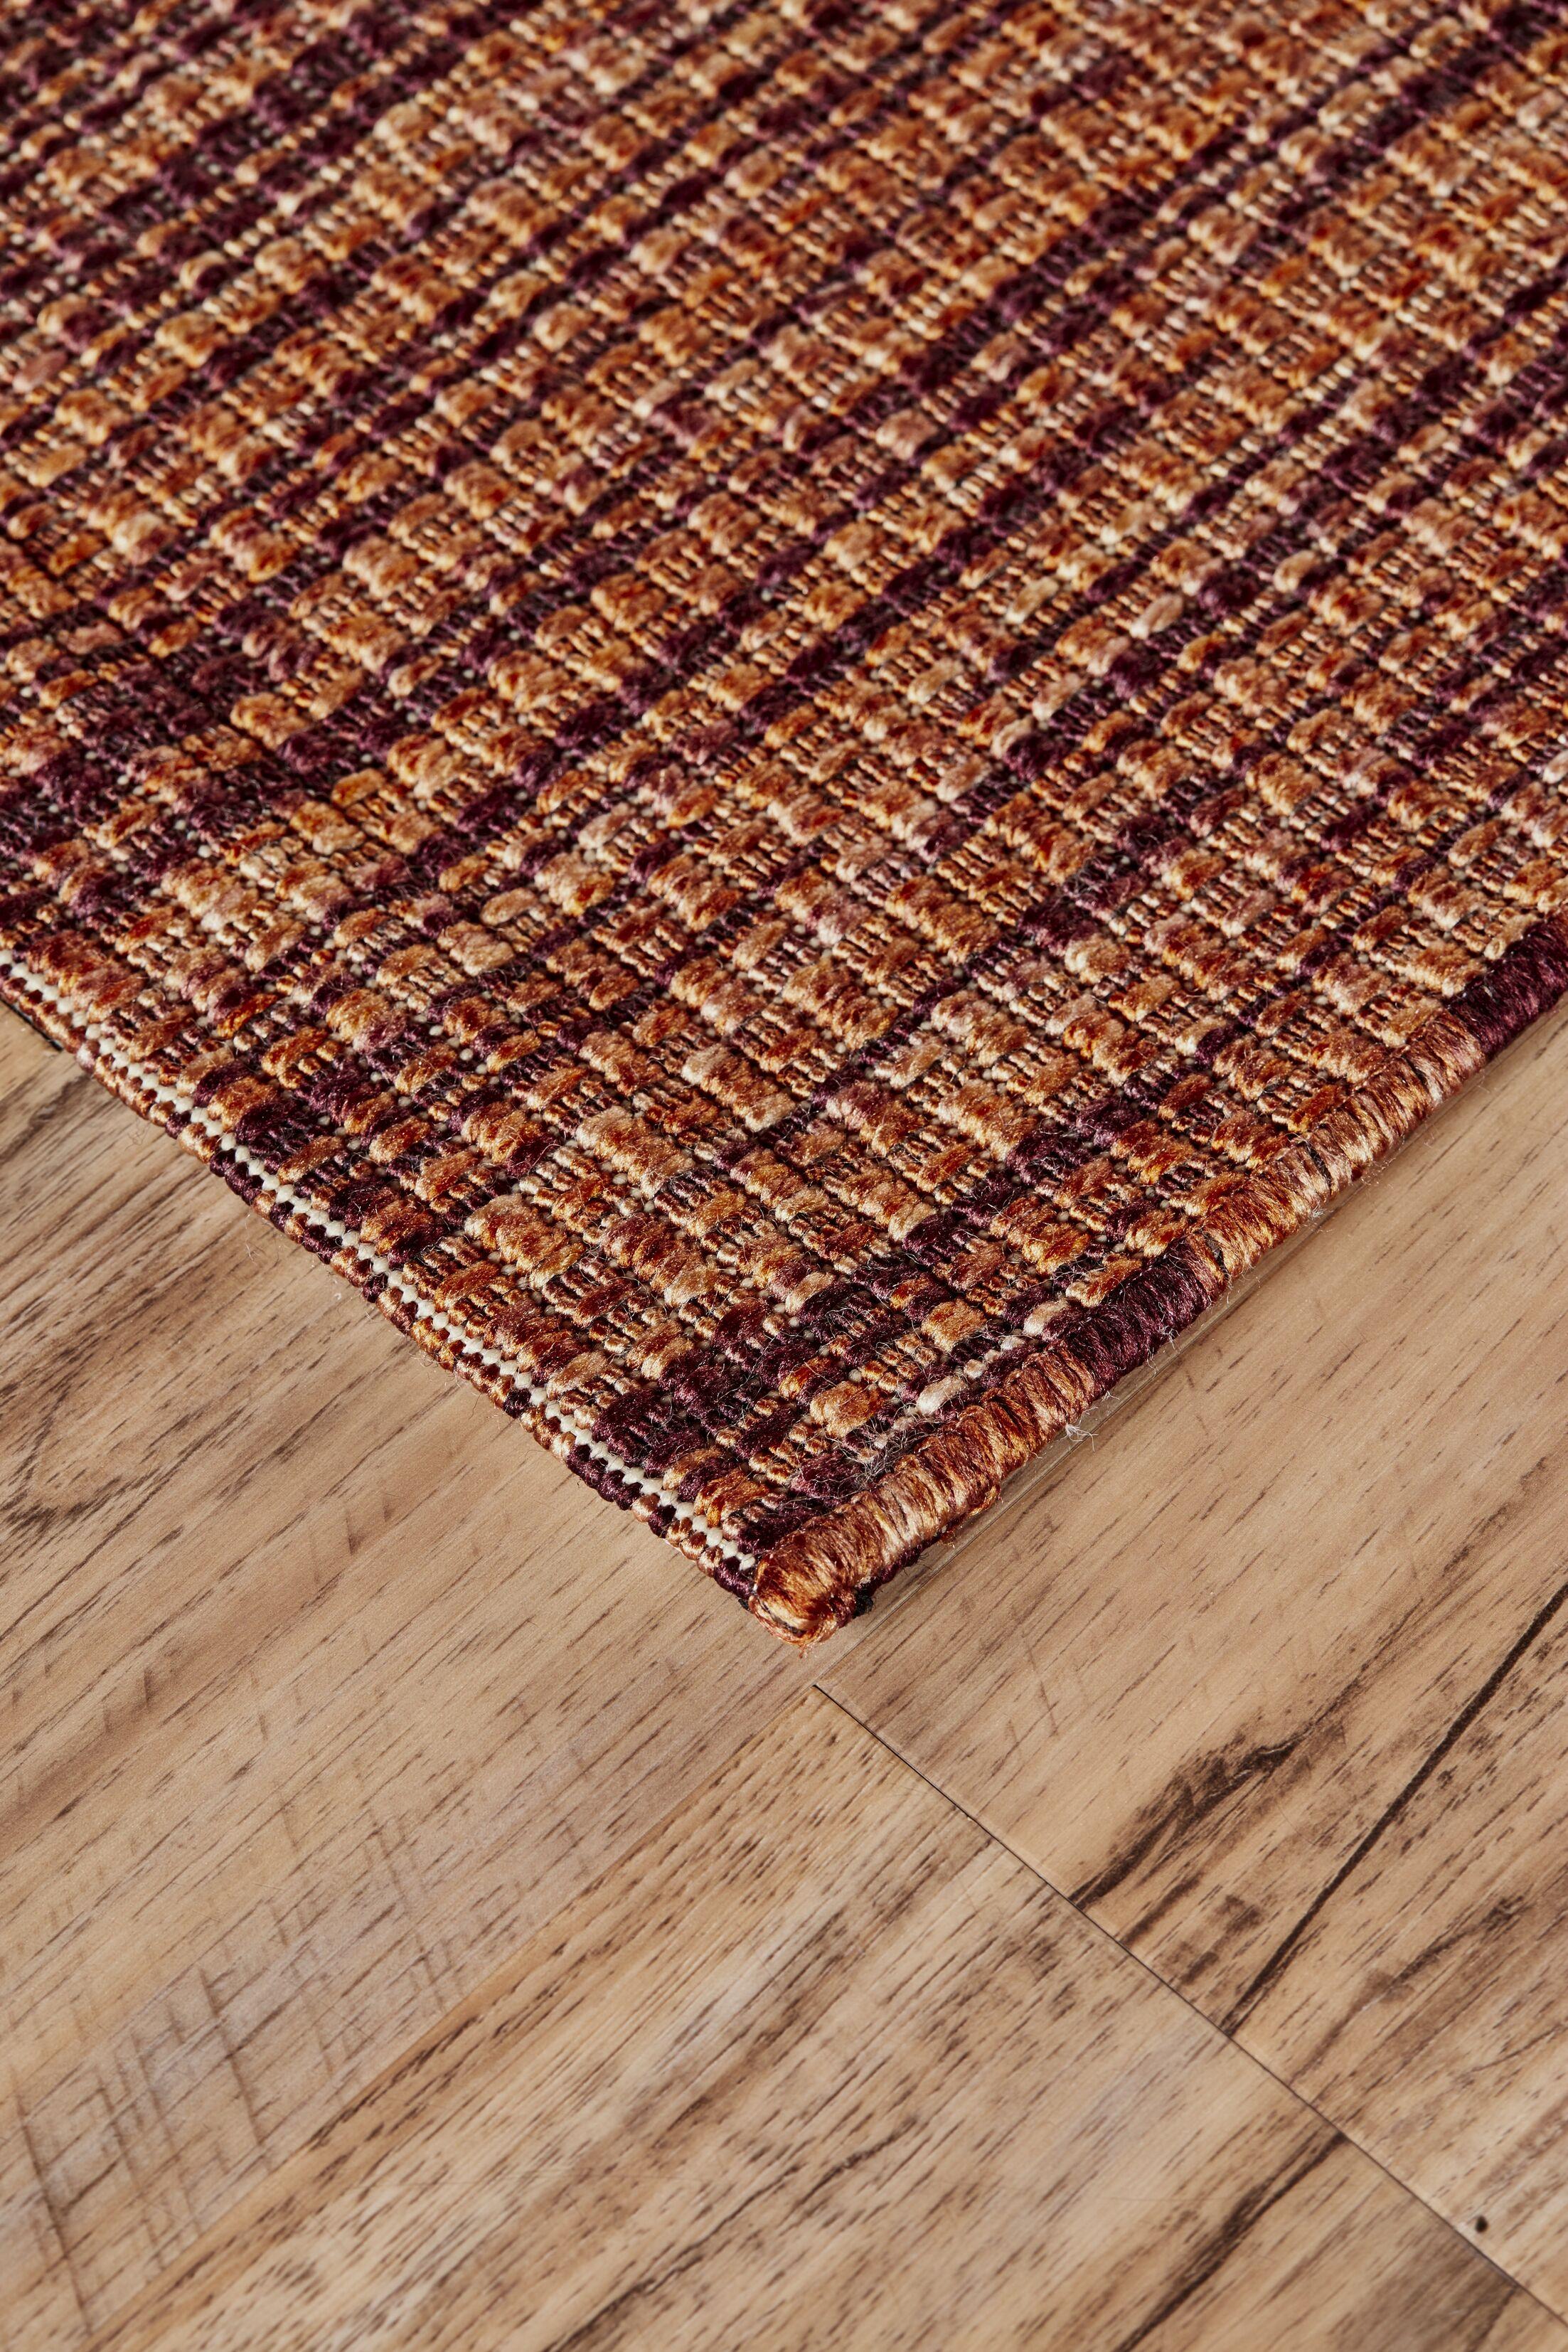 Knutsen Marigold Indoor/Outdoor Area Rug Rug Size: Round 9'-10